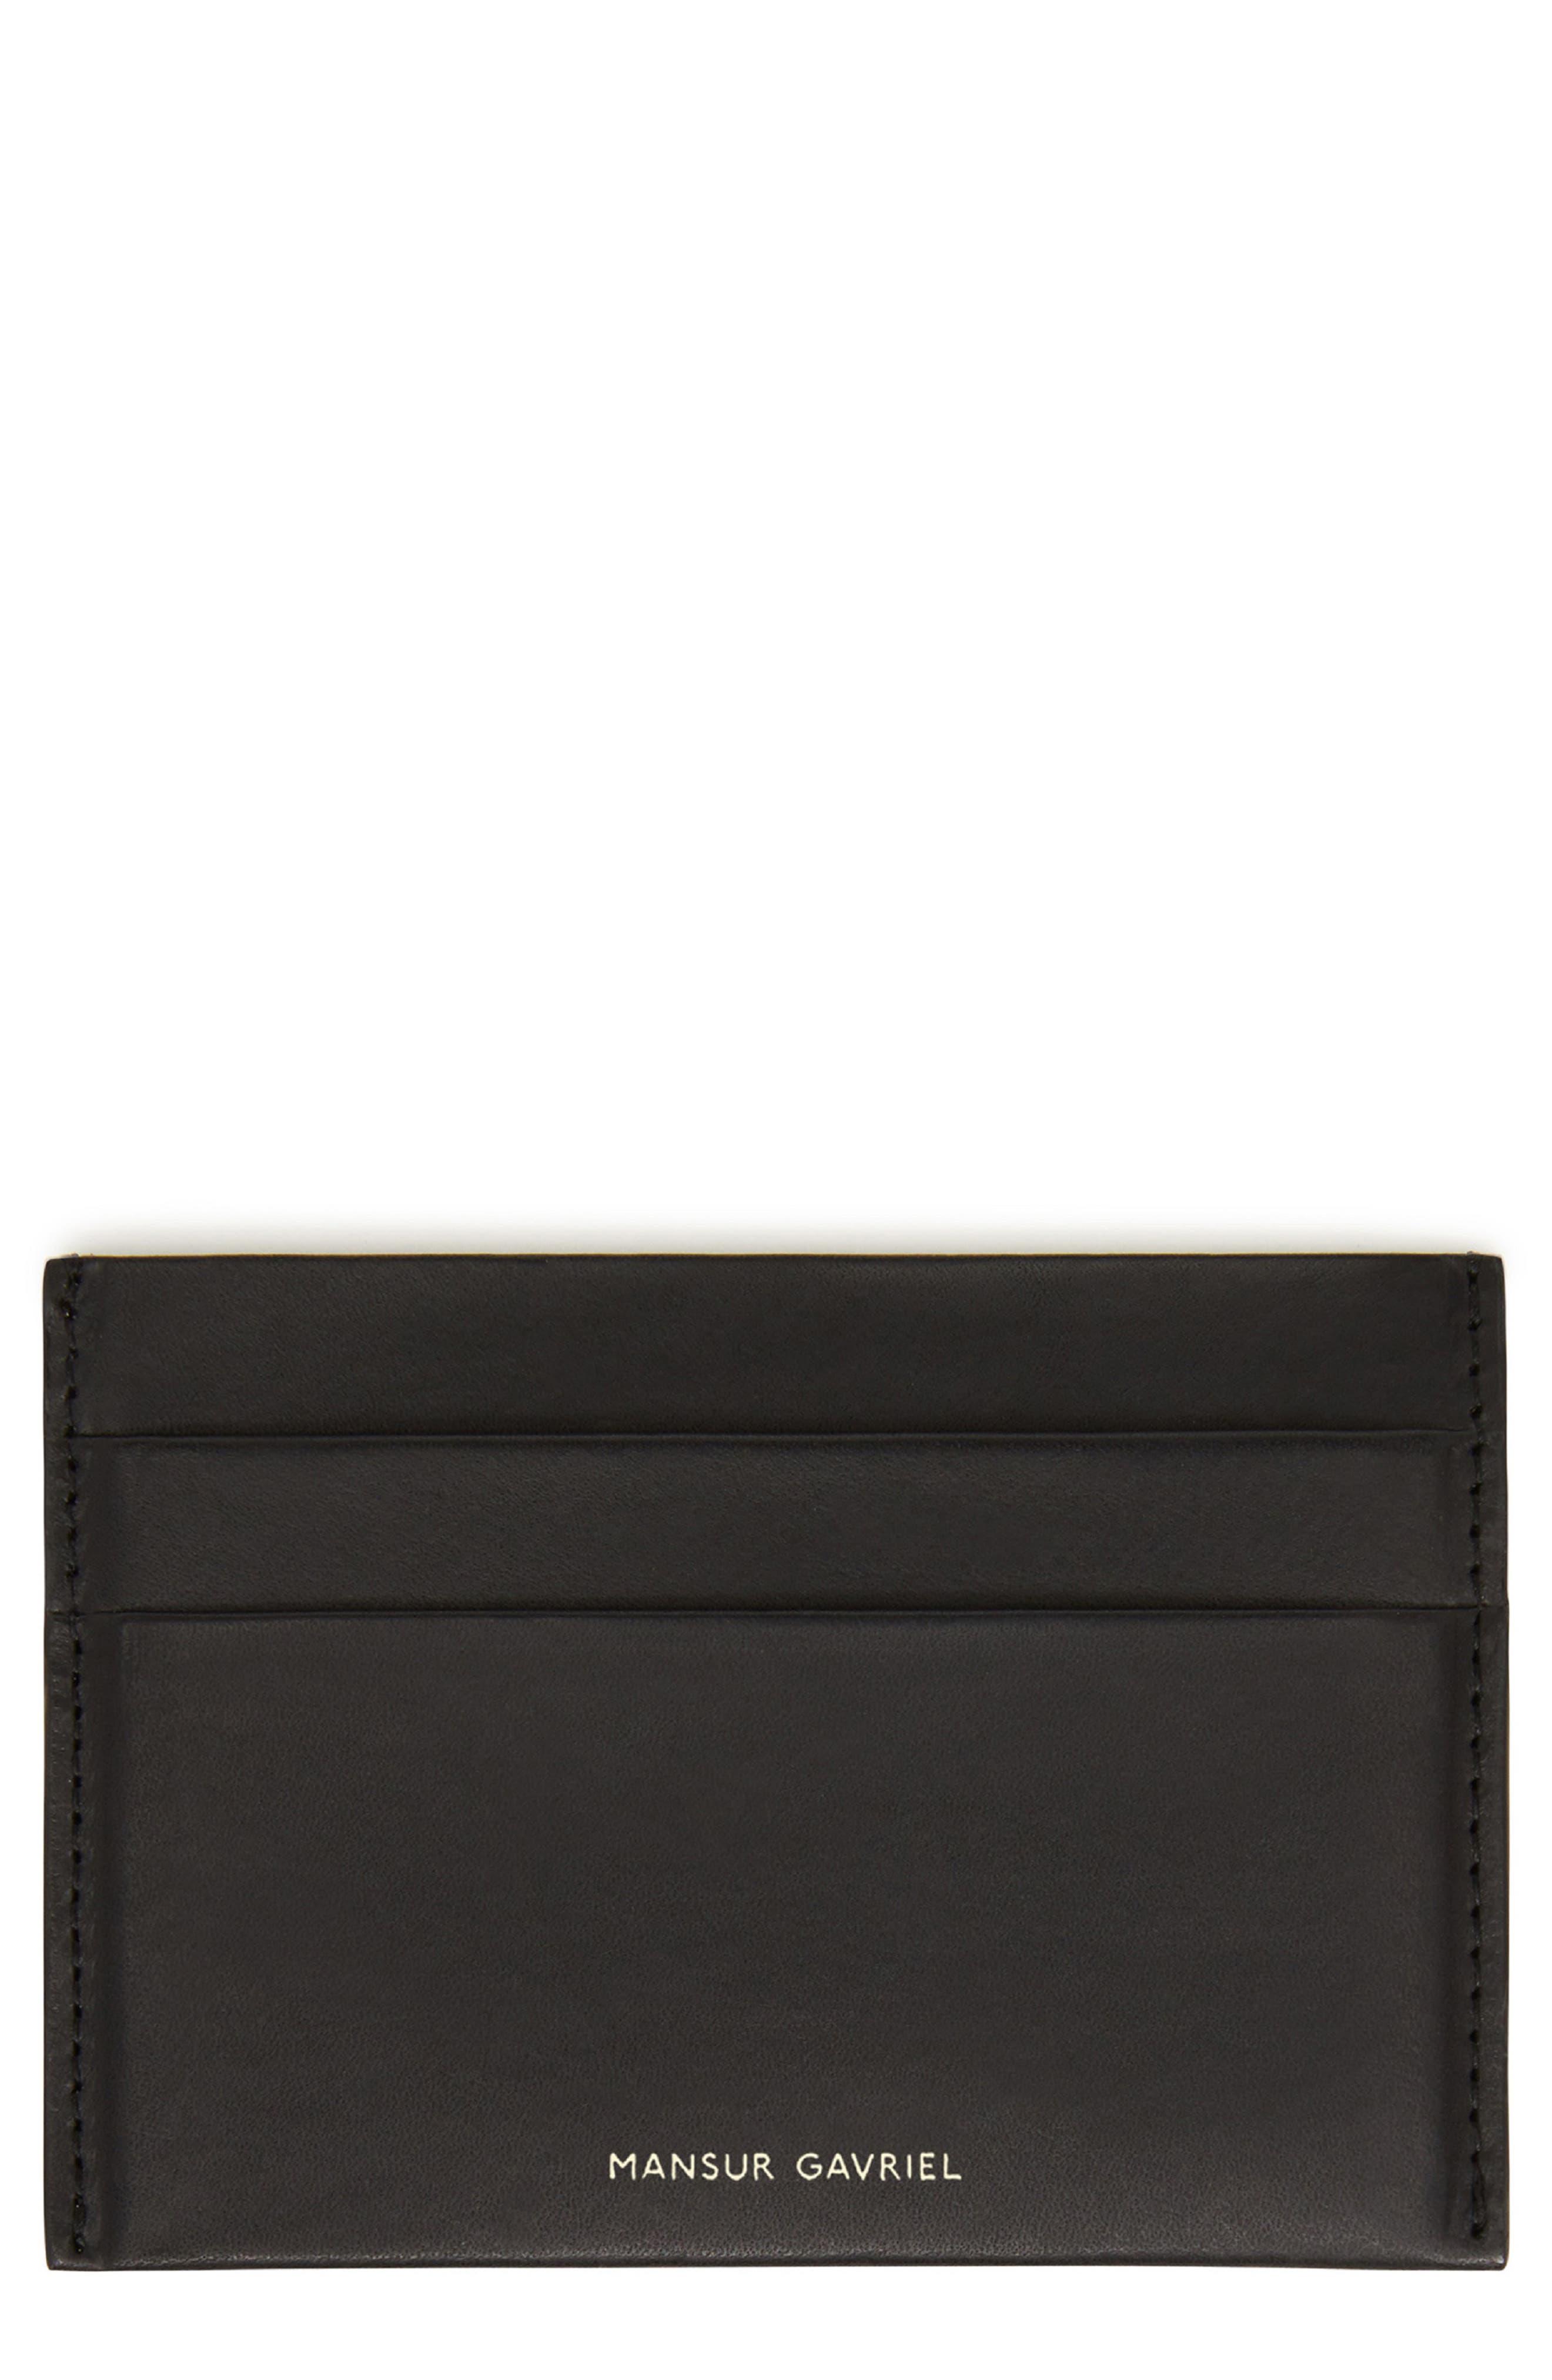 MANSUR GAVRIEL, Leather Card Holder, Main thumbnail 1, color, BLACK